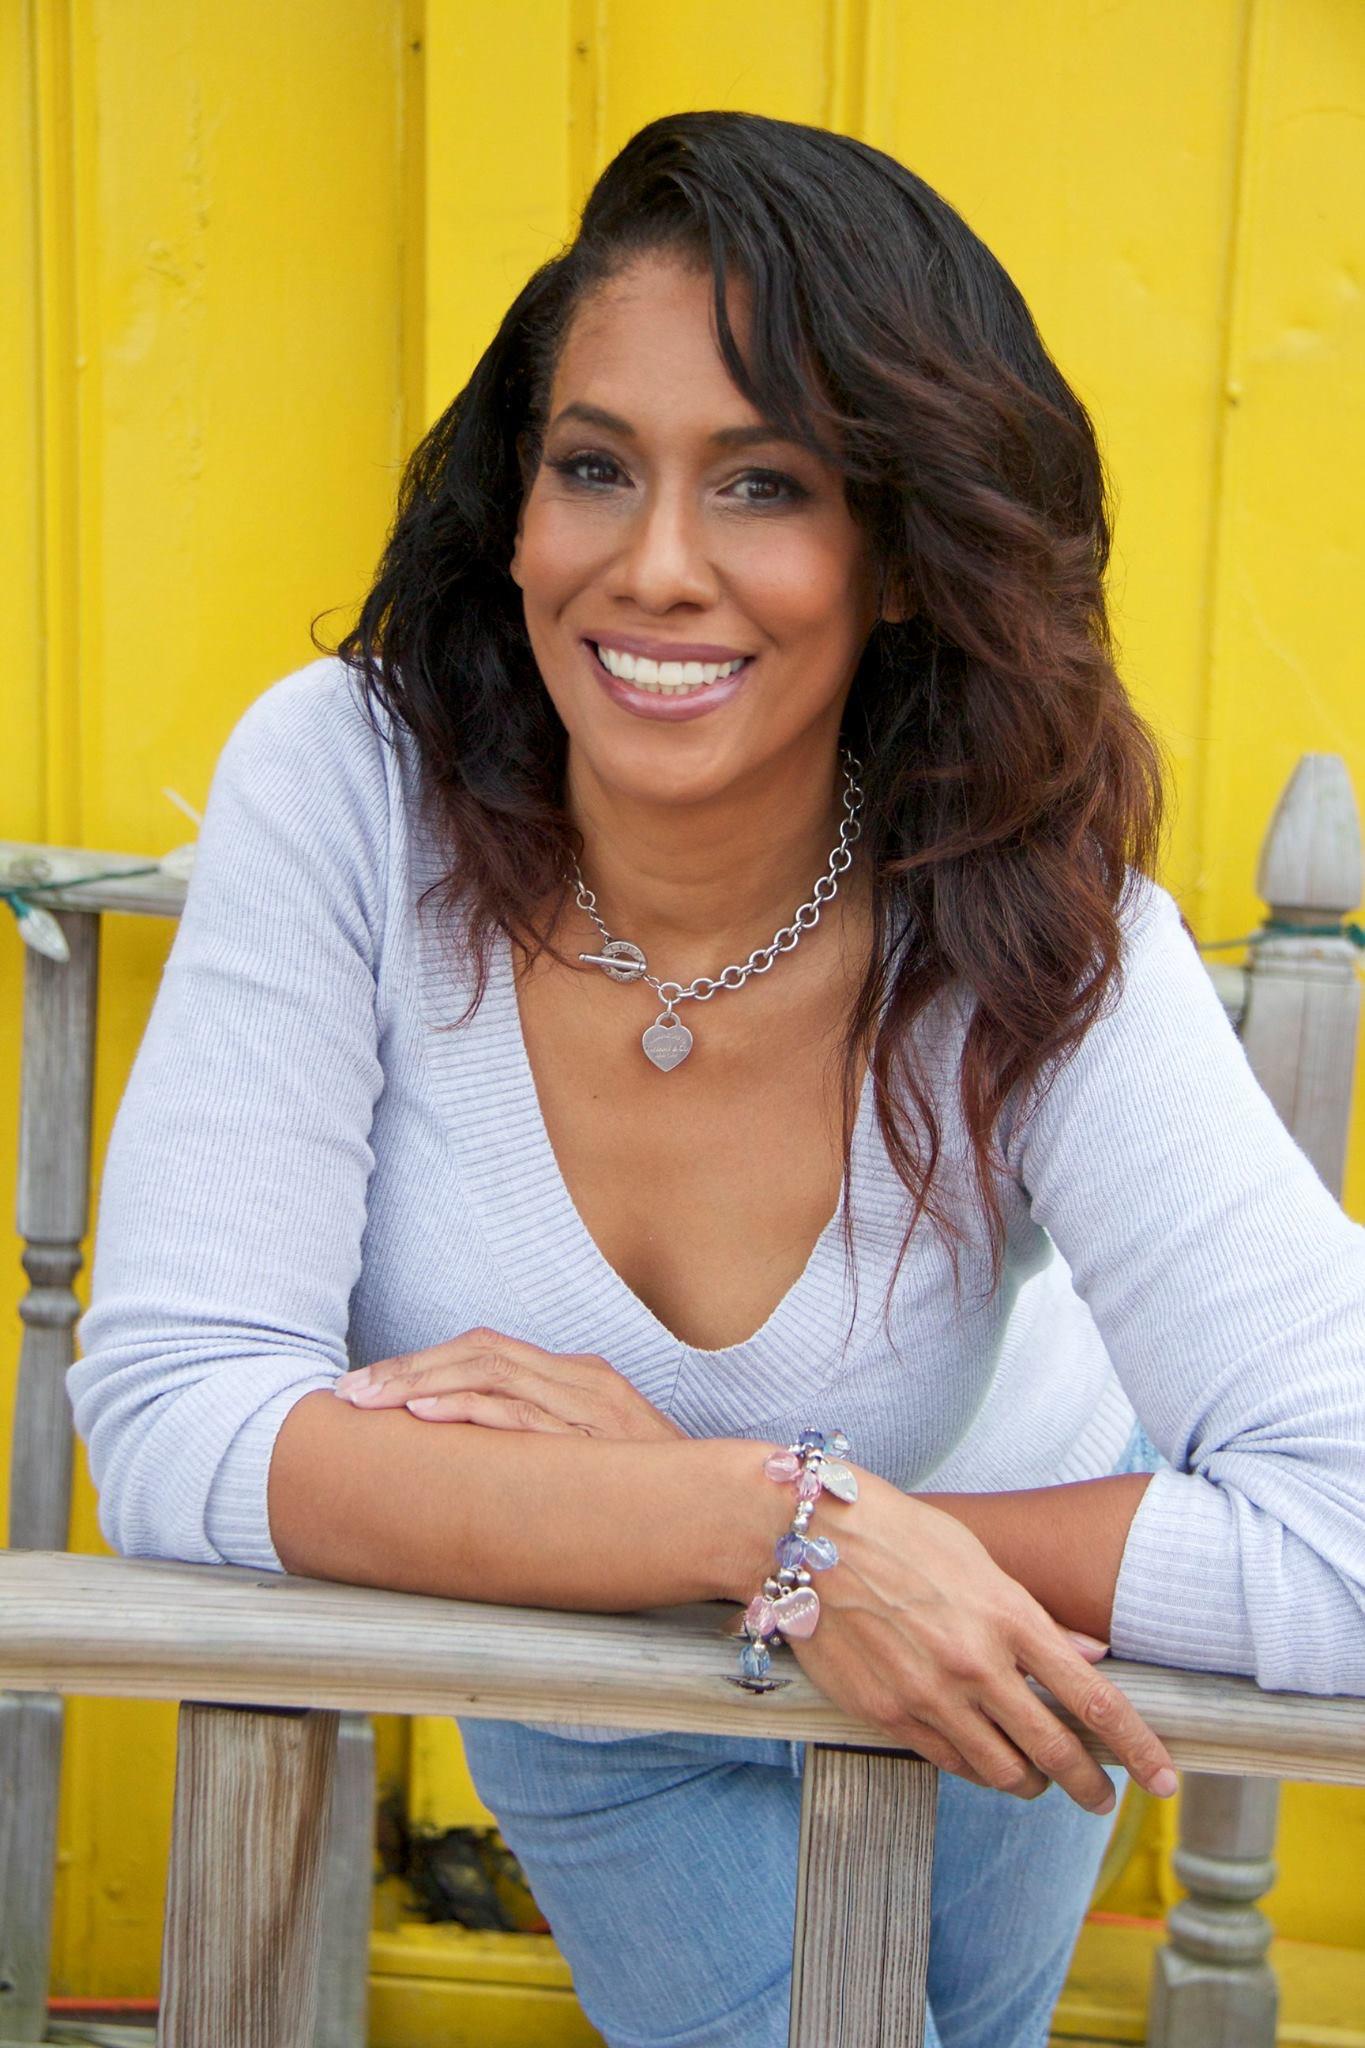 Janice Robinson-Celeste Storytime & Book Signing